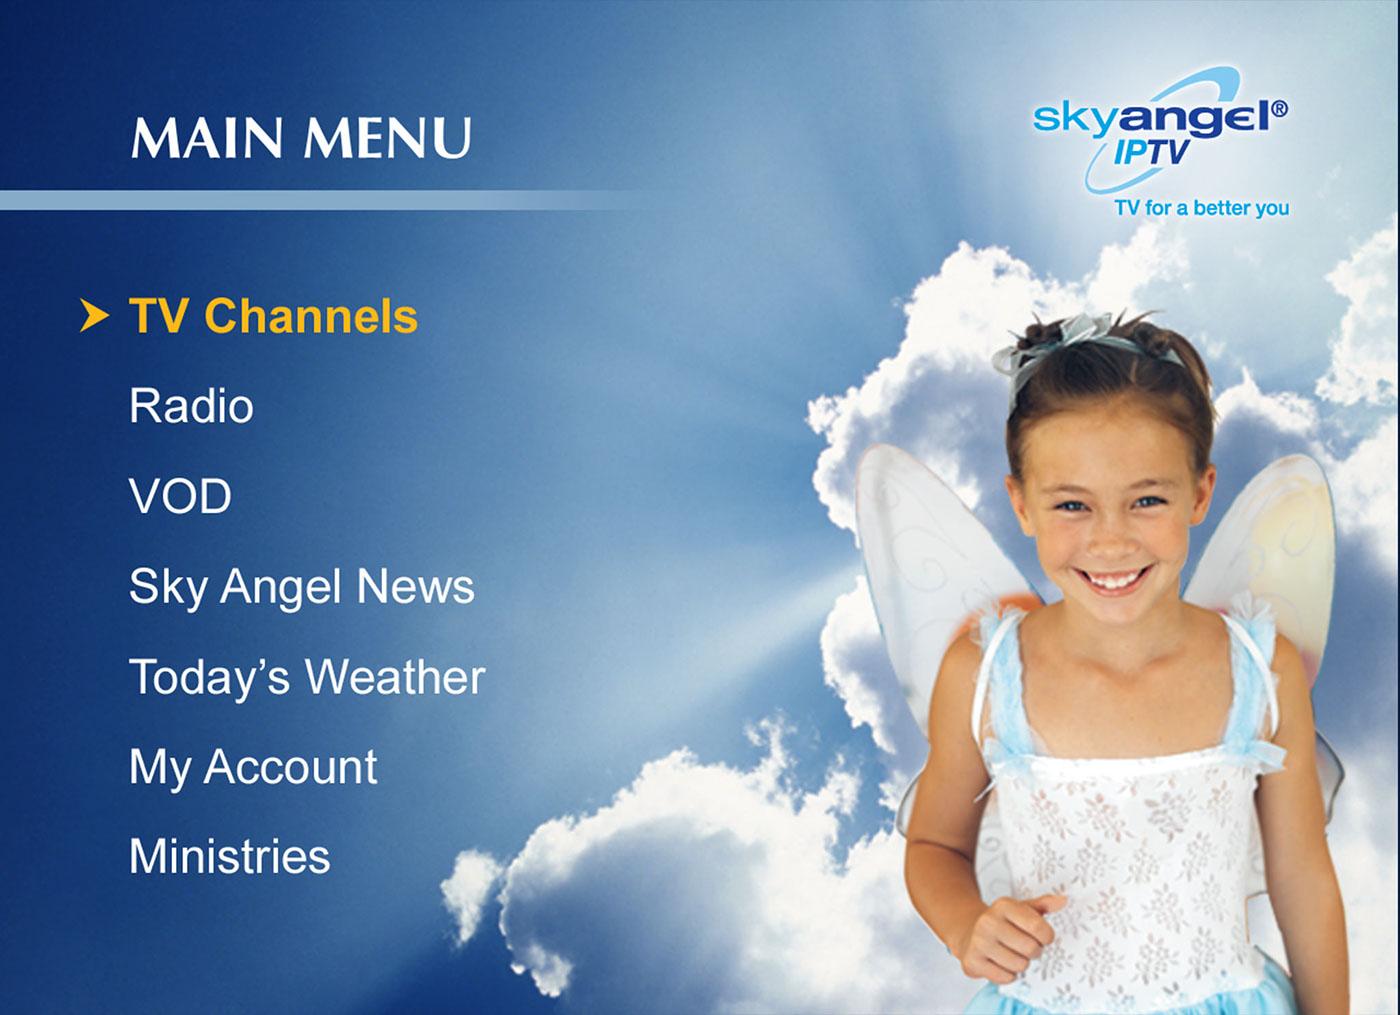 SKY angel  ipTV  GUI  tv  screen  logo interactive  guide